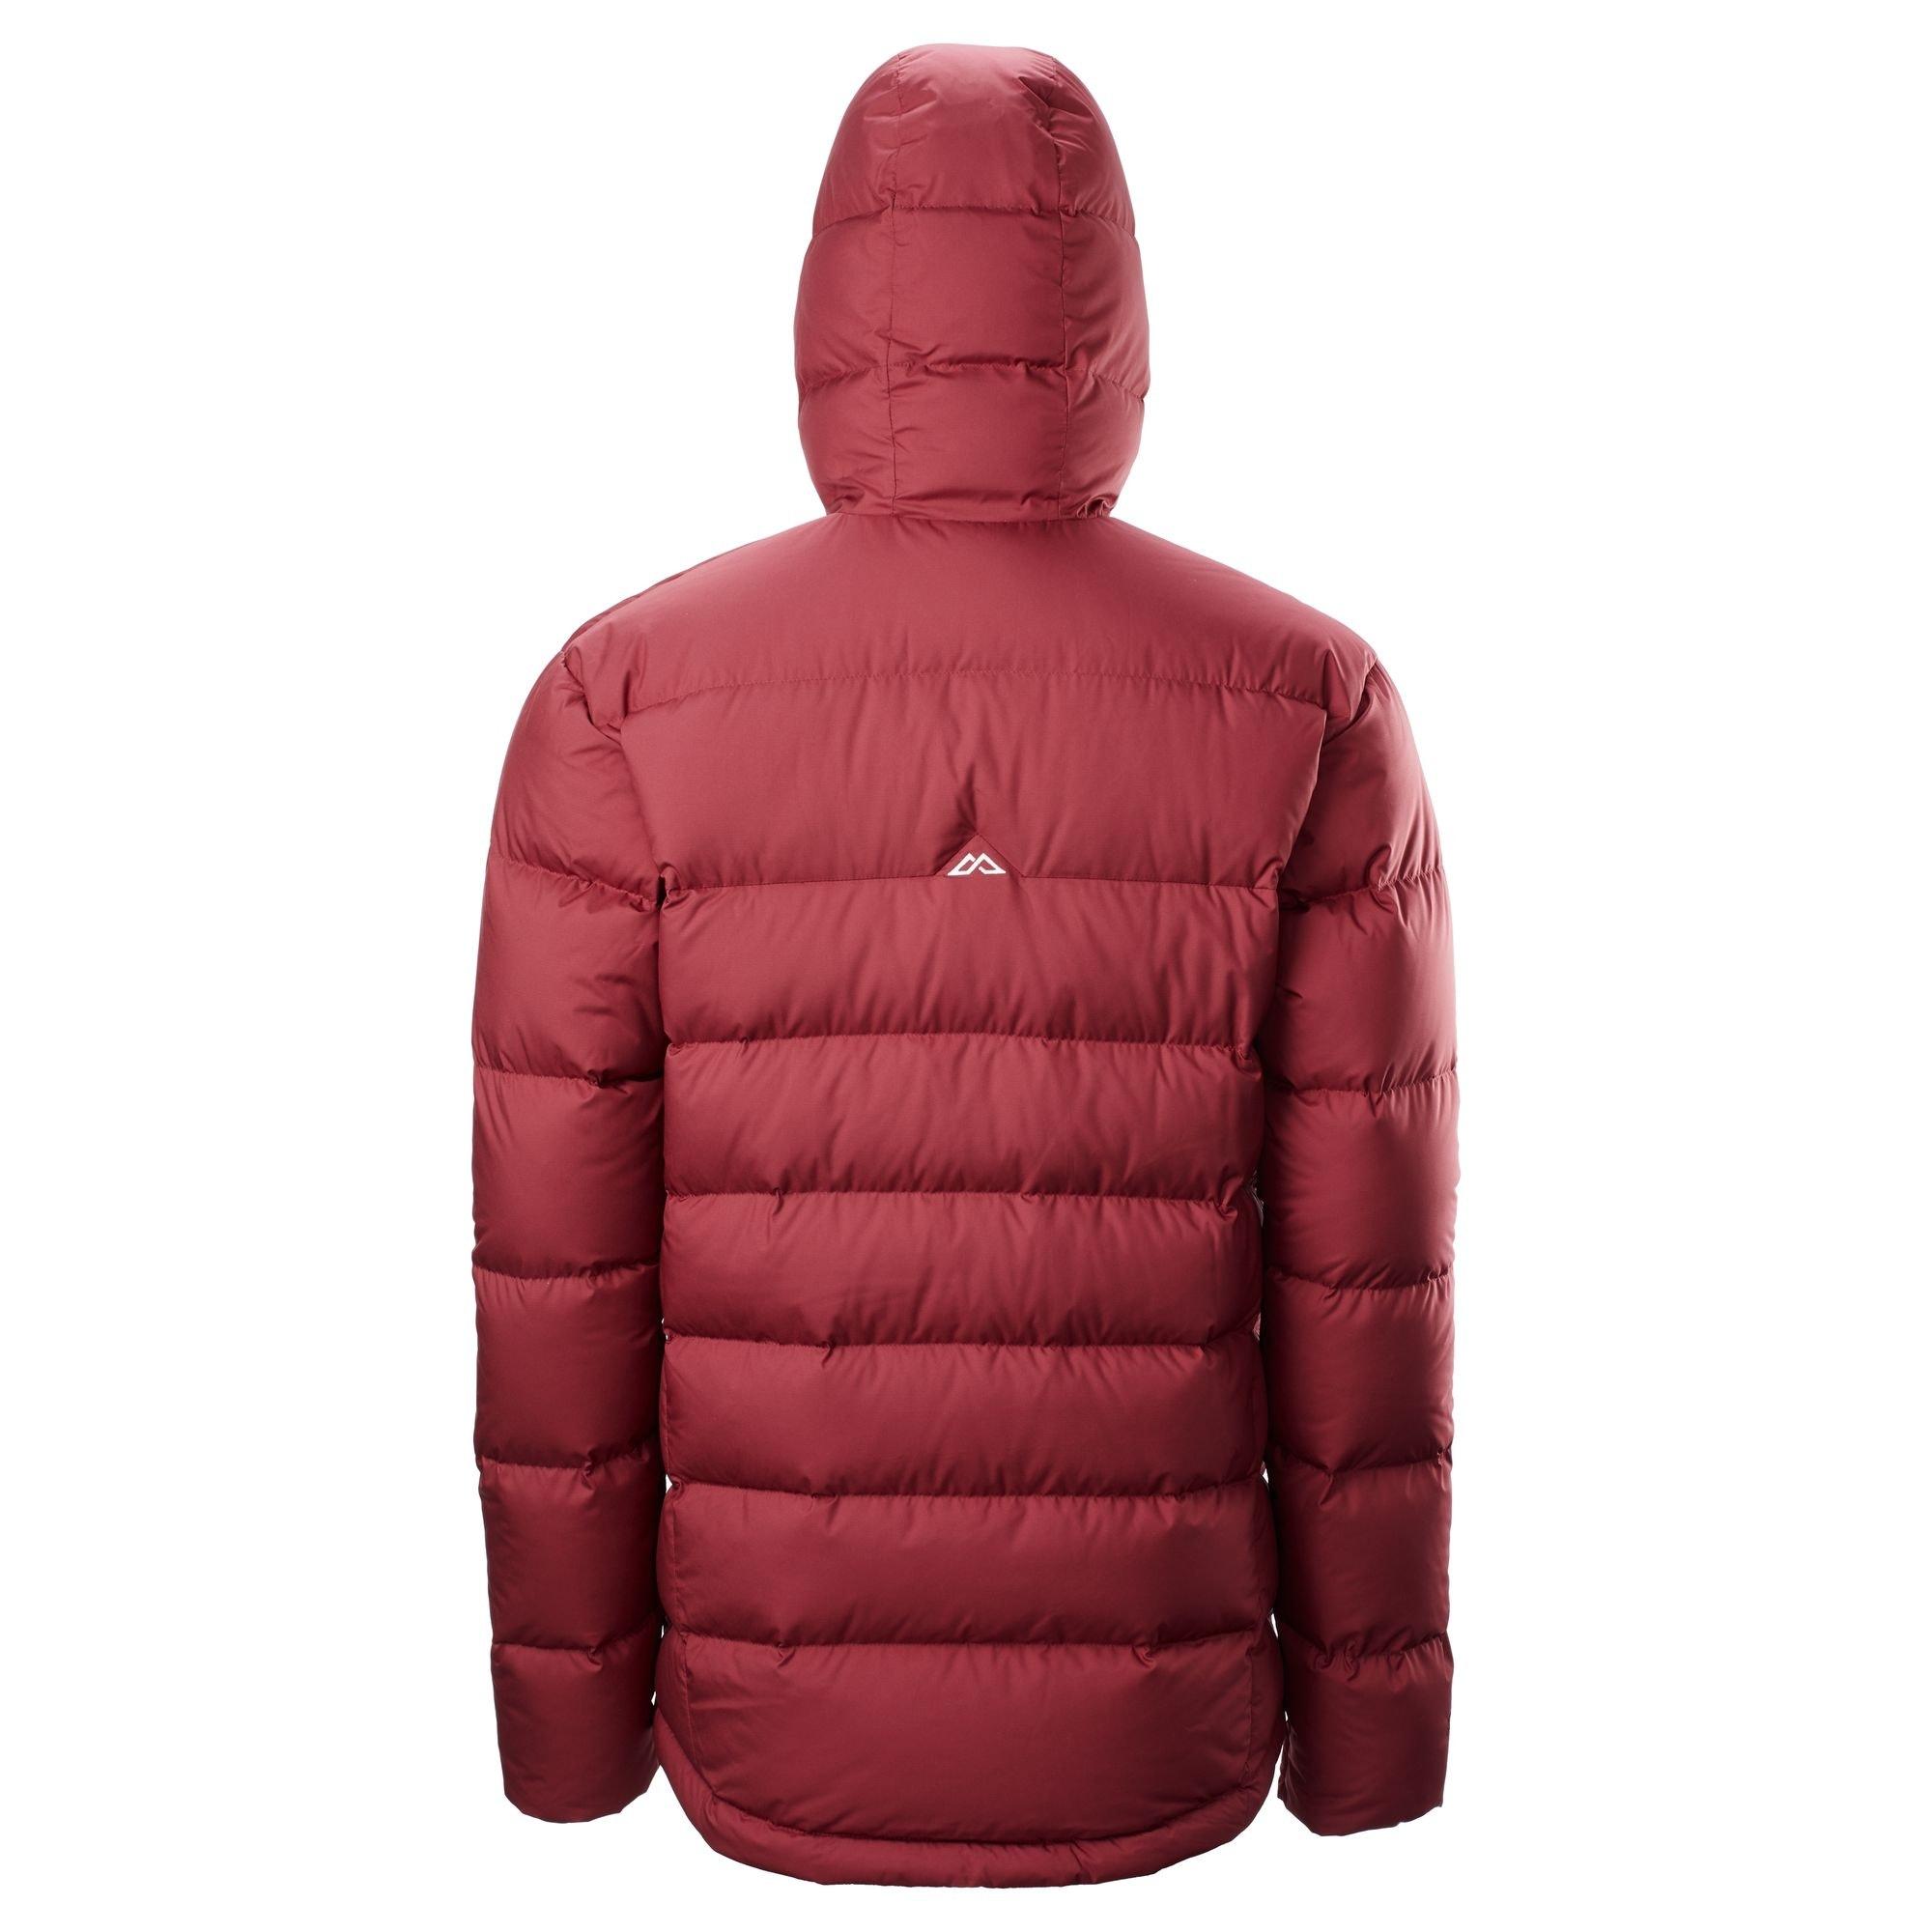 NEW-Kathmandu-Epiq-Men-039-s-Hooded-Warm-Winter-Duck-Down-Puffer-Jacket-v2 thumbnail 29